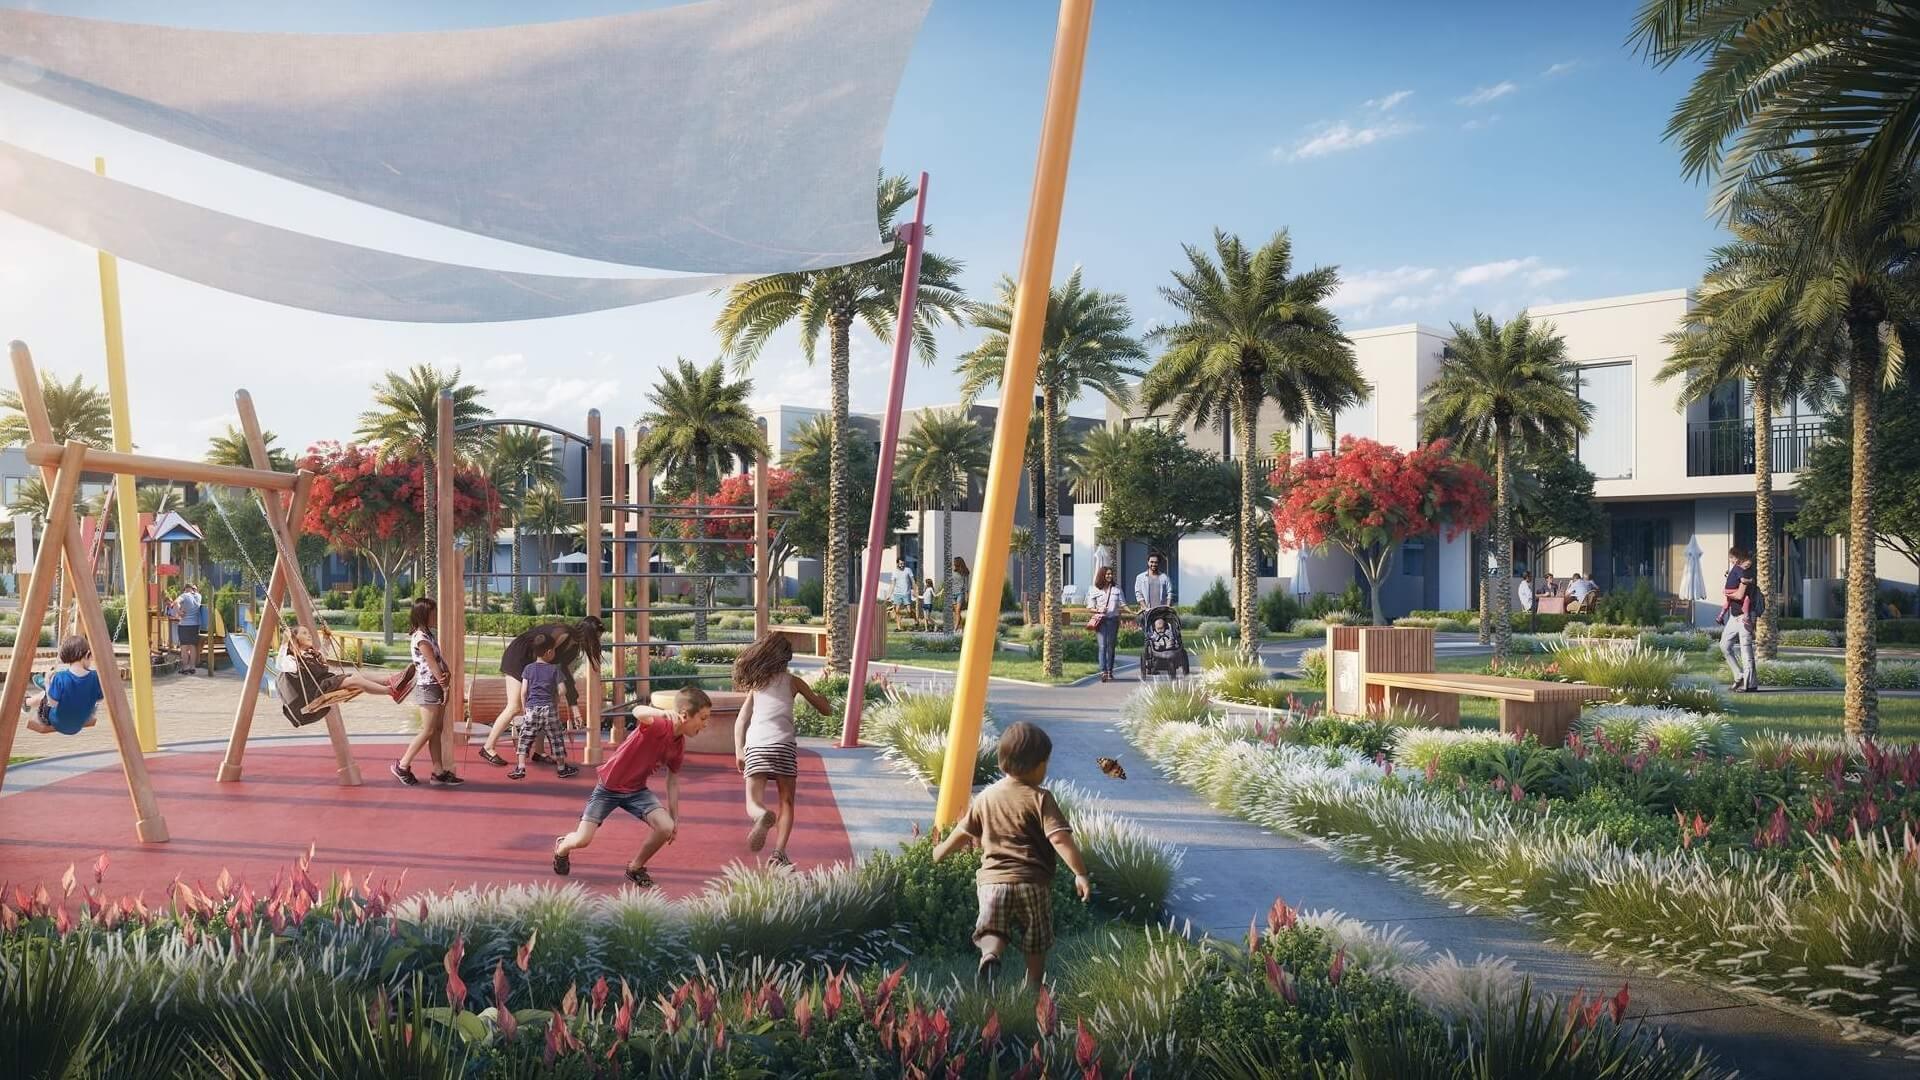 EXPO GOLF, Dubai South (Dubai World Central), UAE – photo 4